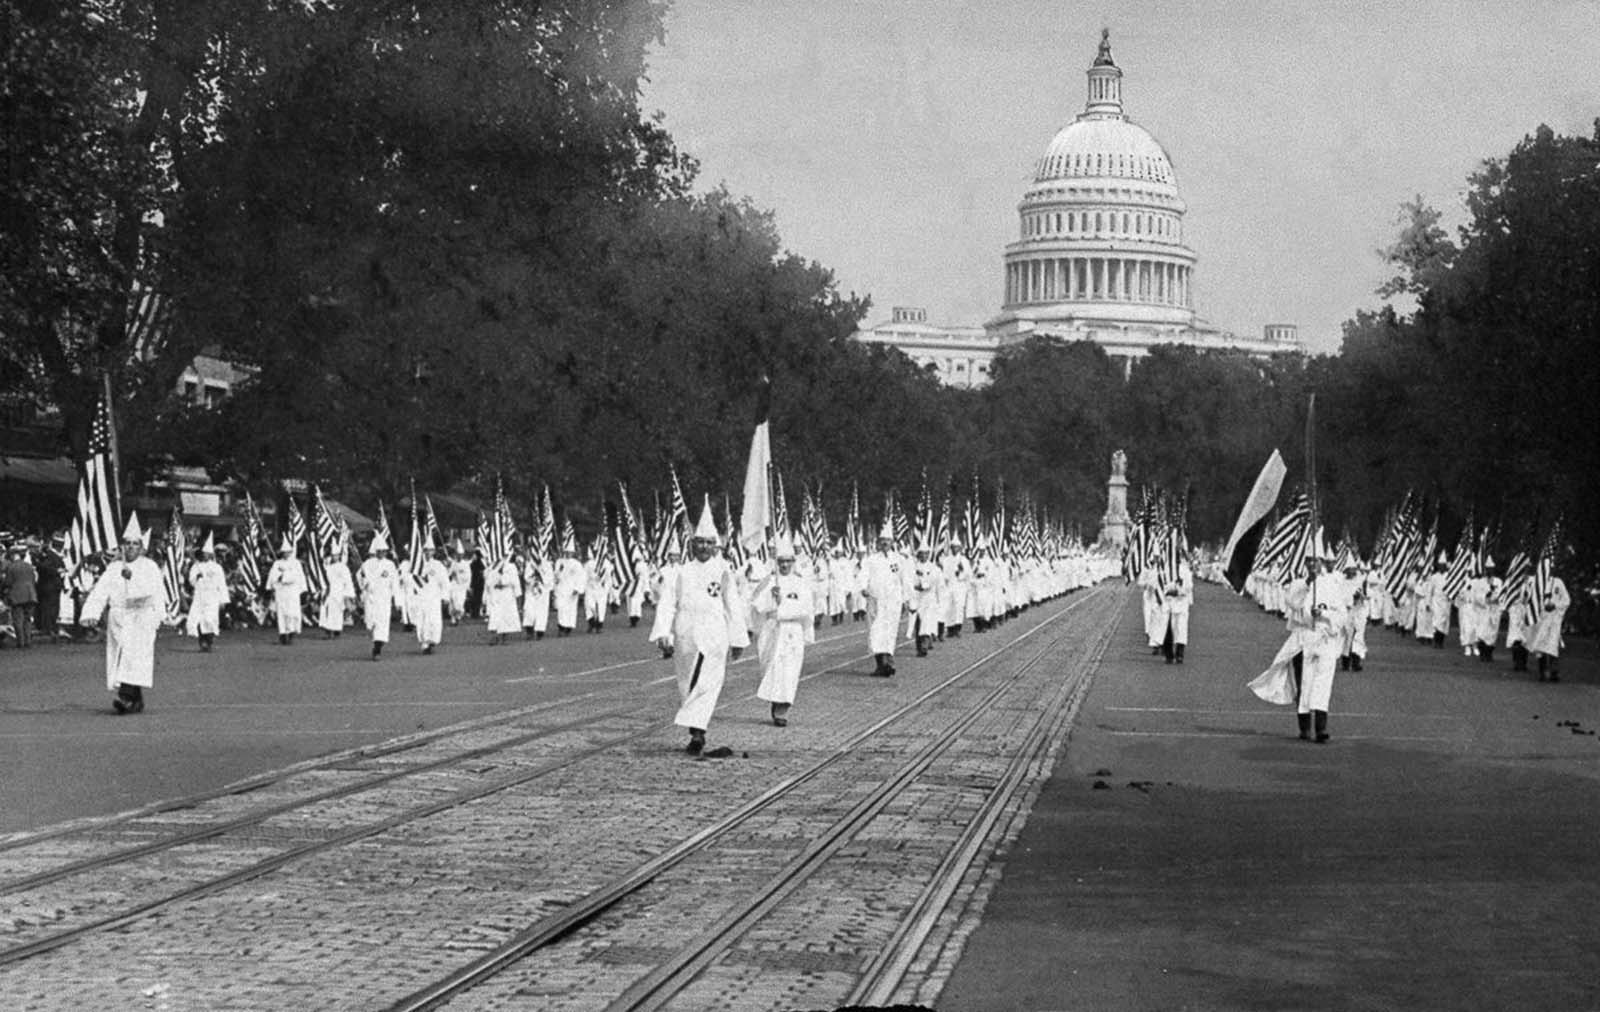 The KKK Washington Parade of 1926.